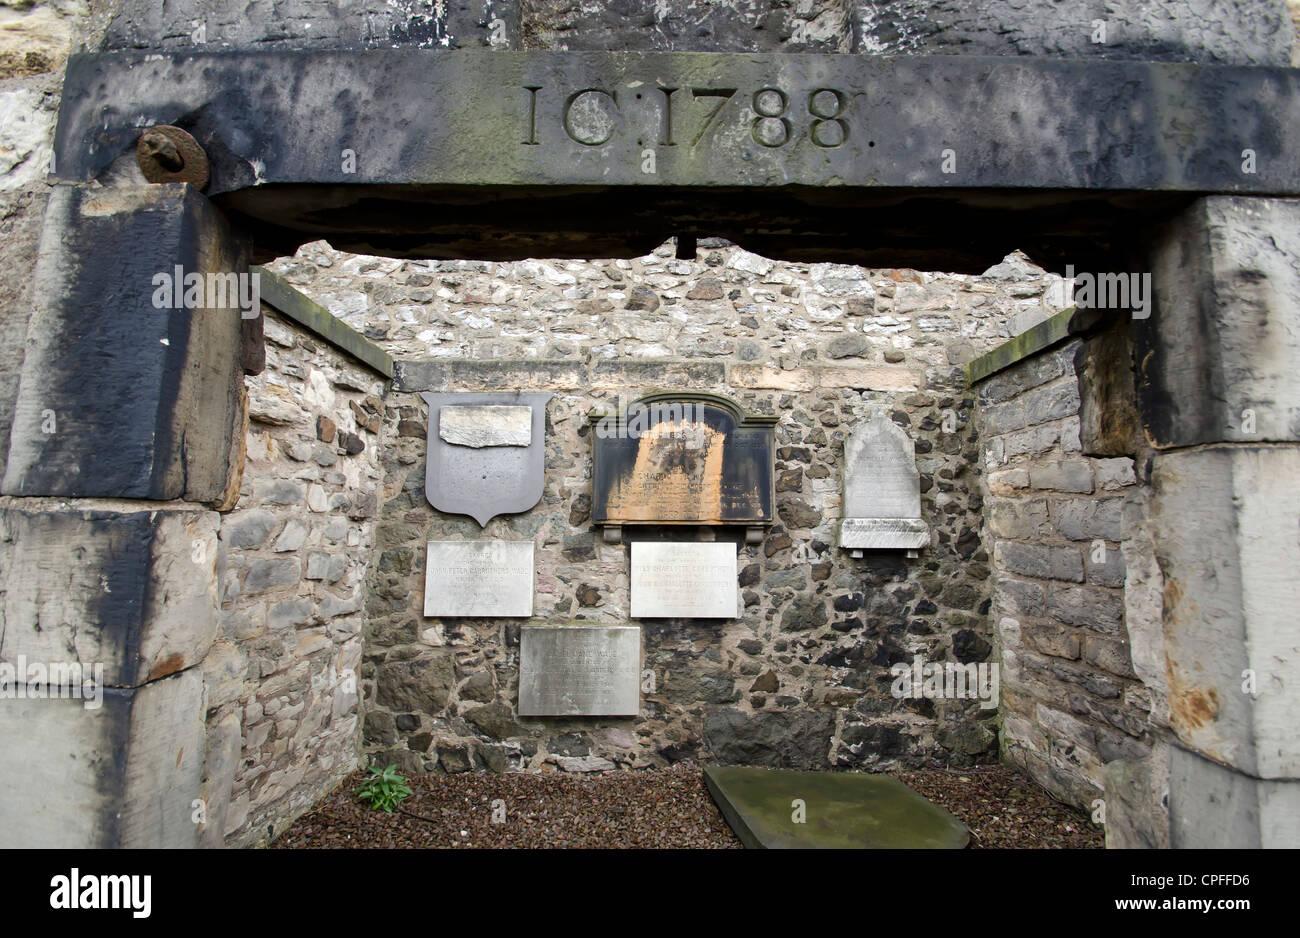 The old Calton Cemetery (burial ground) in the centre of Edinburgh, Scotland. Stock Photo